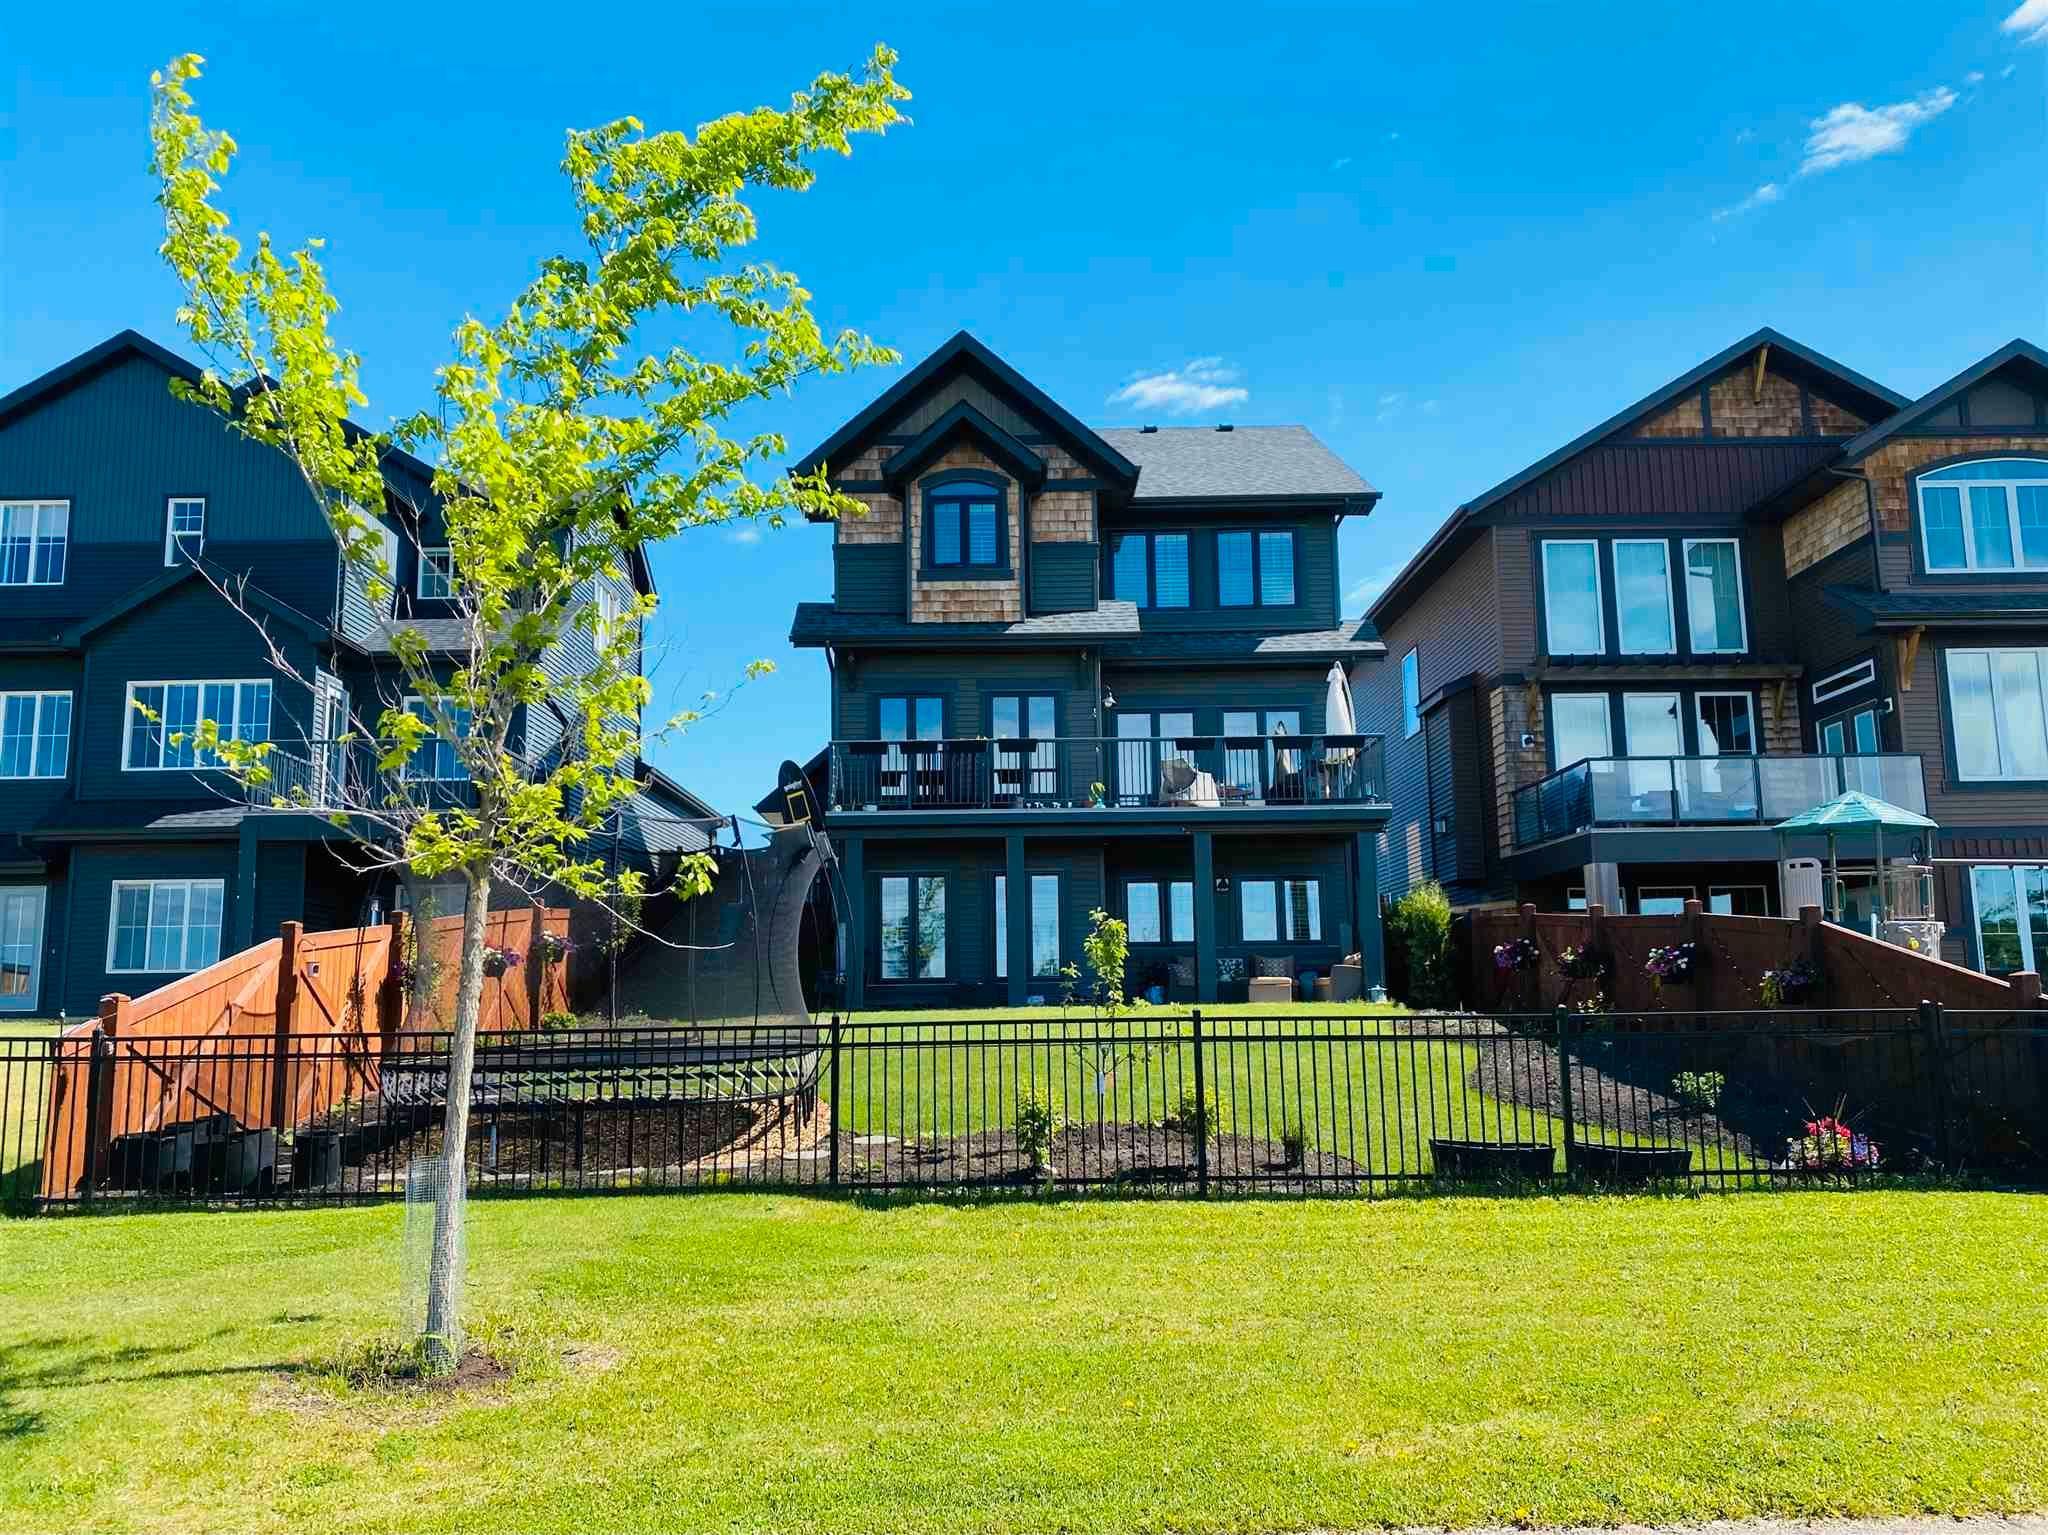 Main Photo: 1408 GRAYDON HILL Way in Edmonton: Zone 55 House for sale : MLS®# E4249410